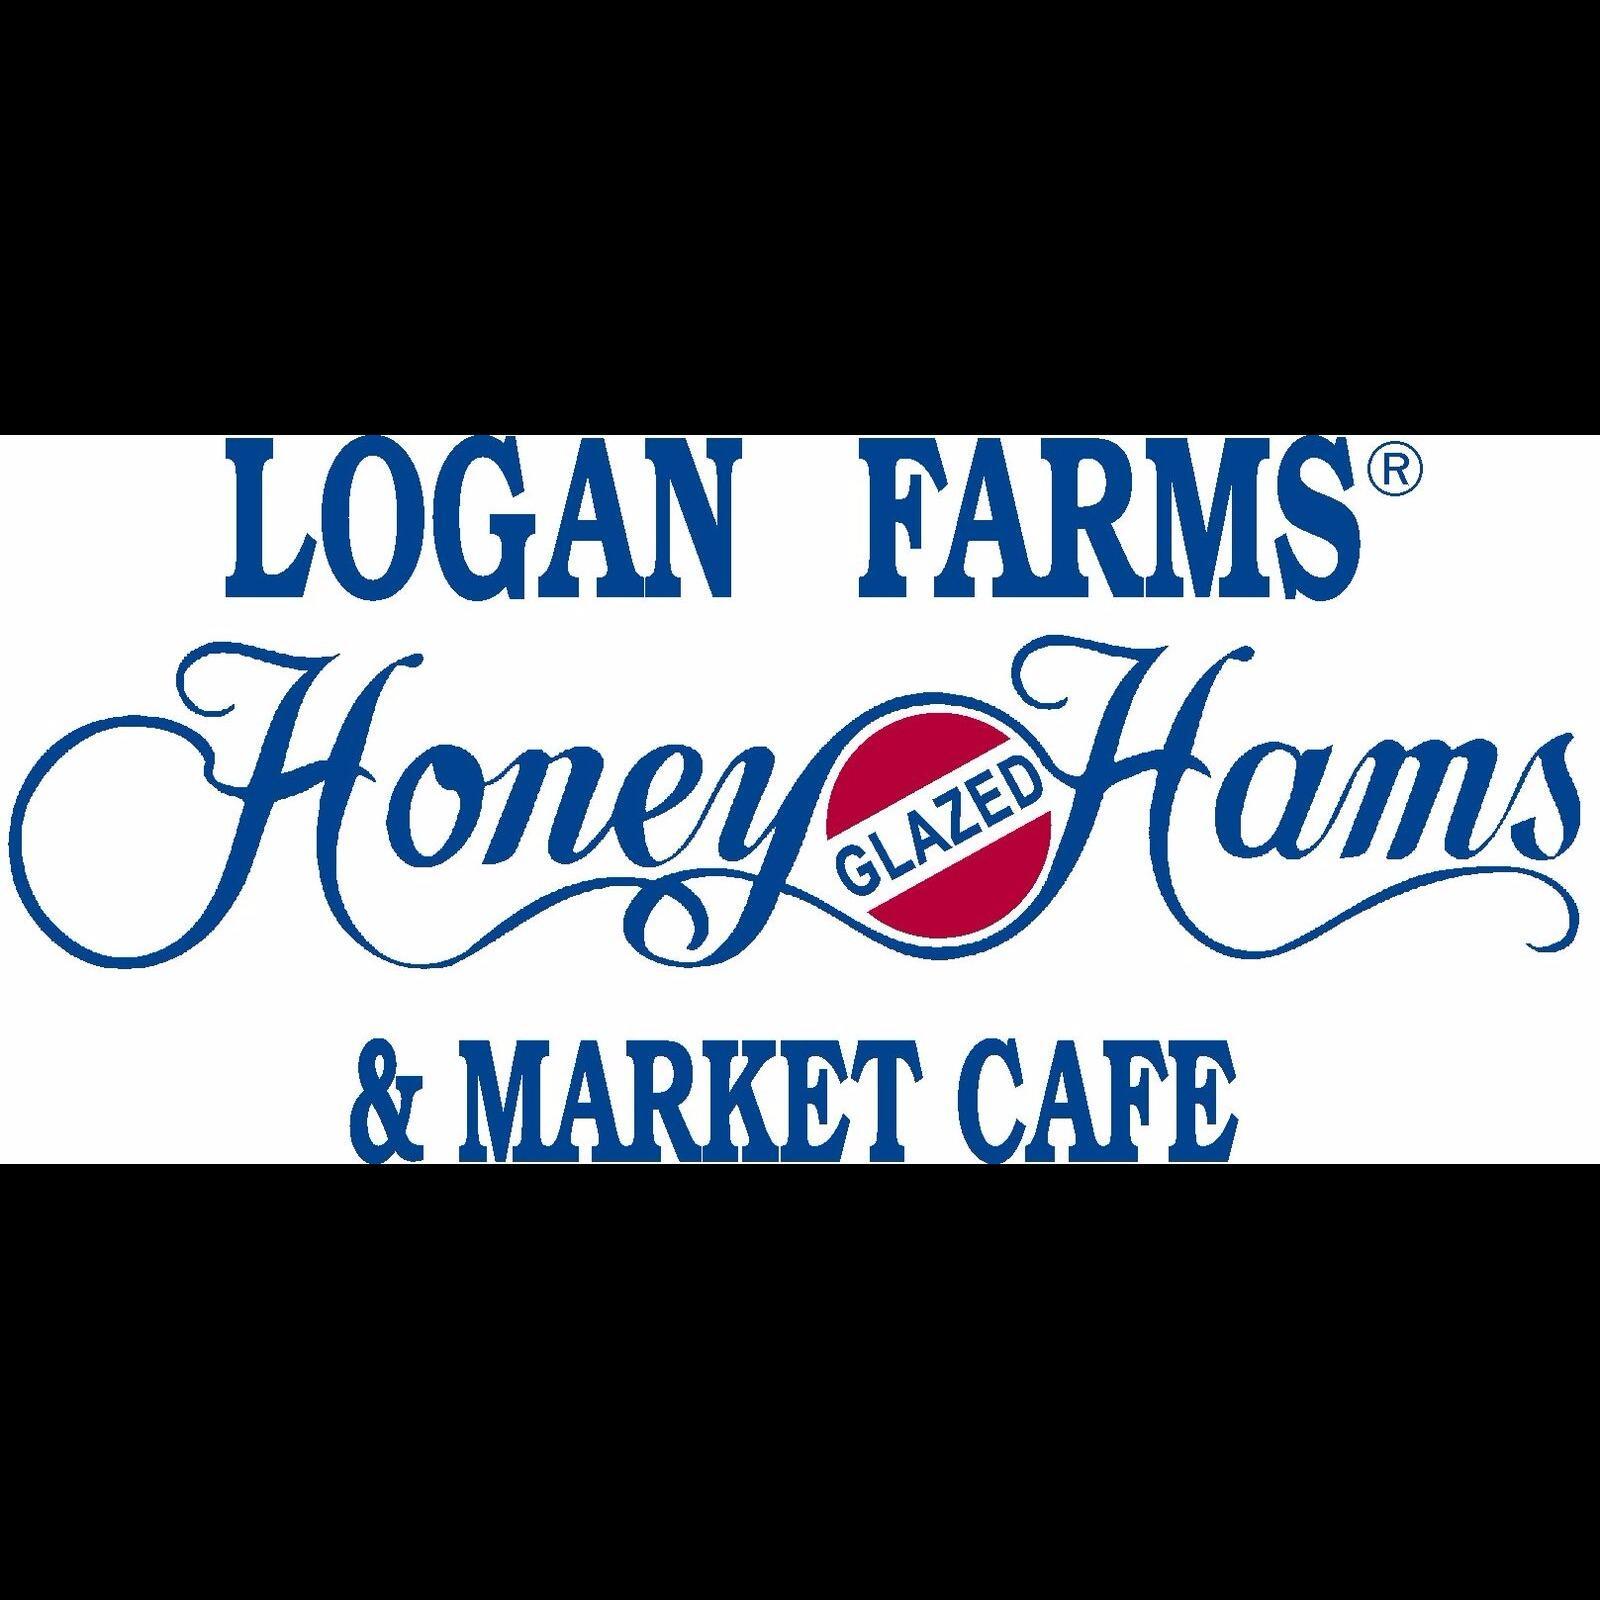 Logan Farms Honey Glazed Hams